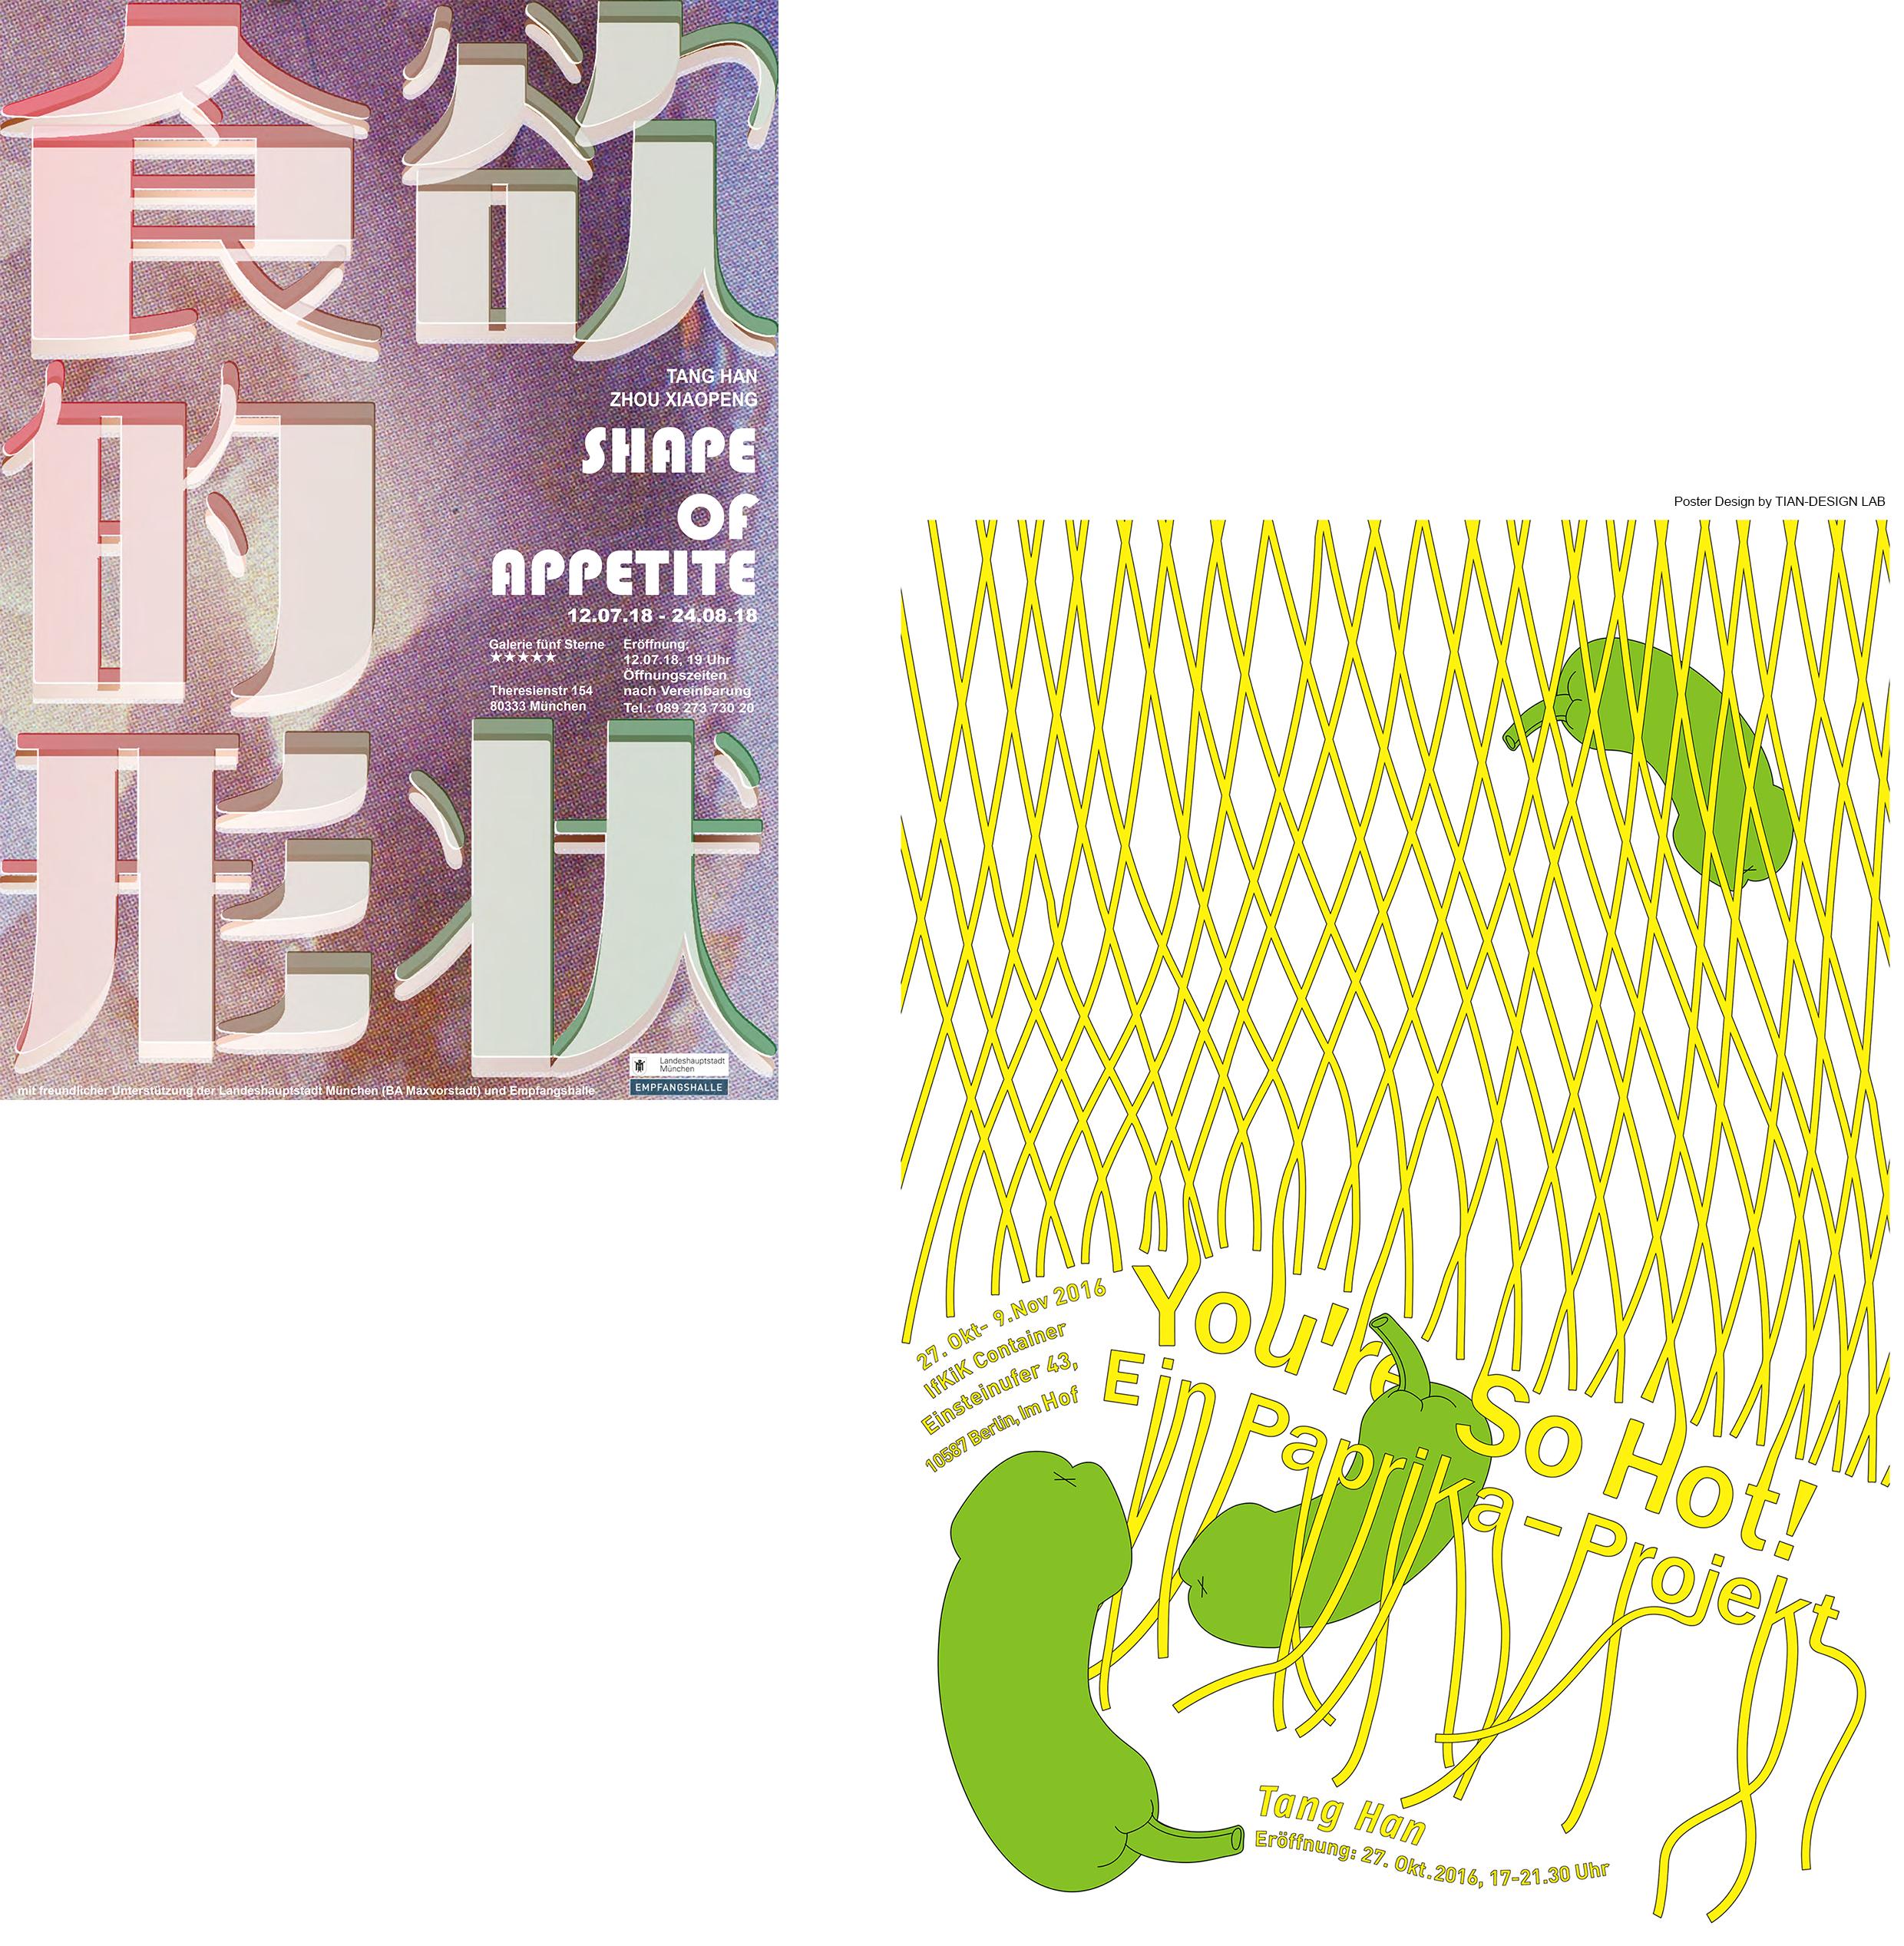 Tang Han-You're so hot-paprika projekt- Shape of appetite